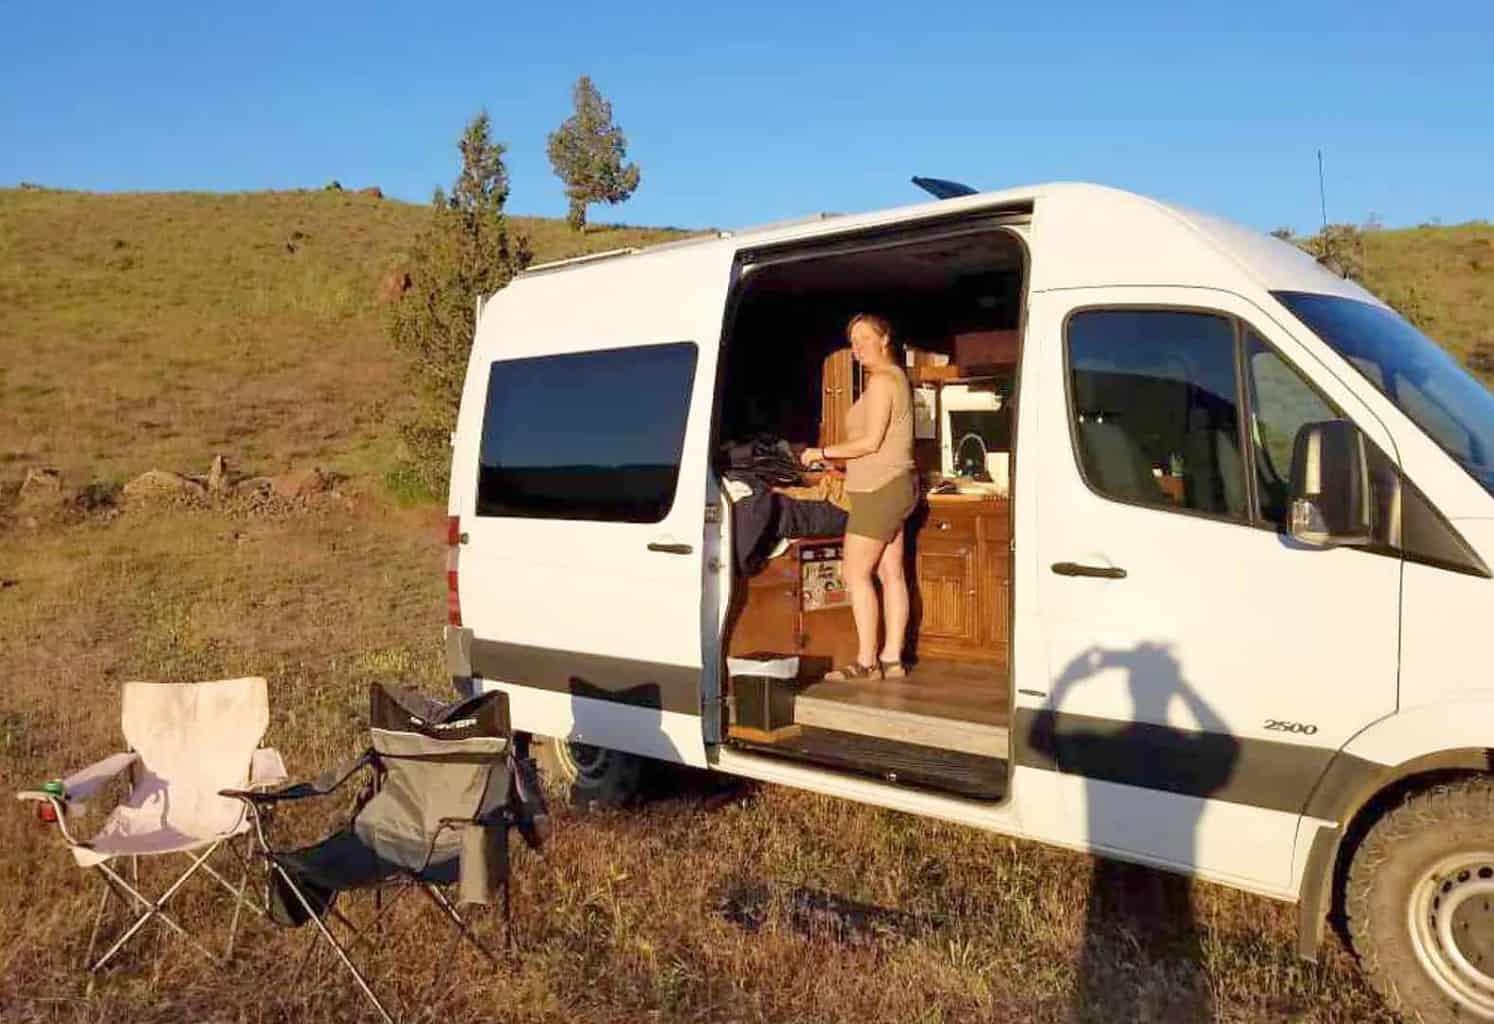 Rent a Sprinter Van! [$40 Off]